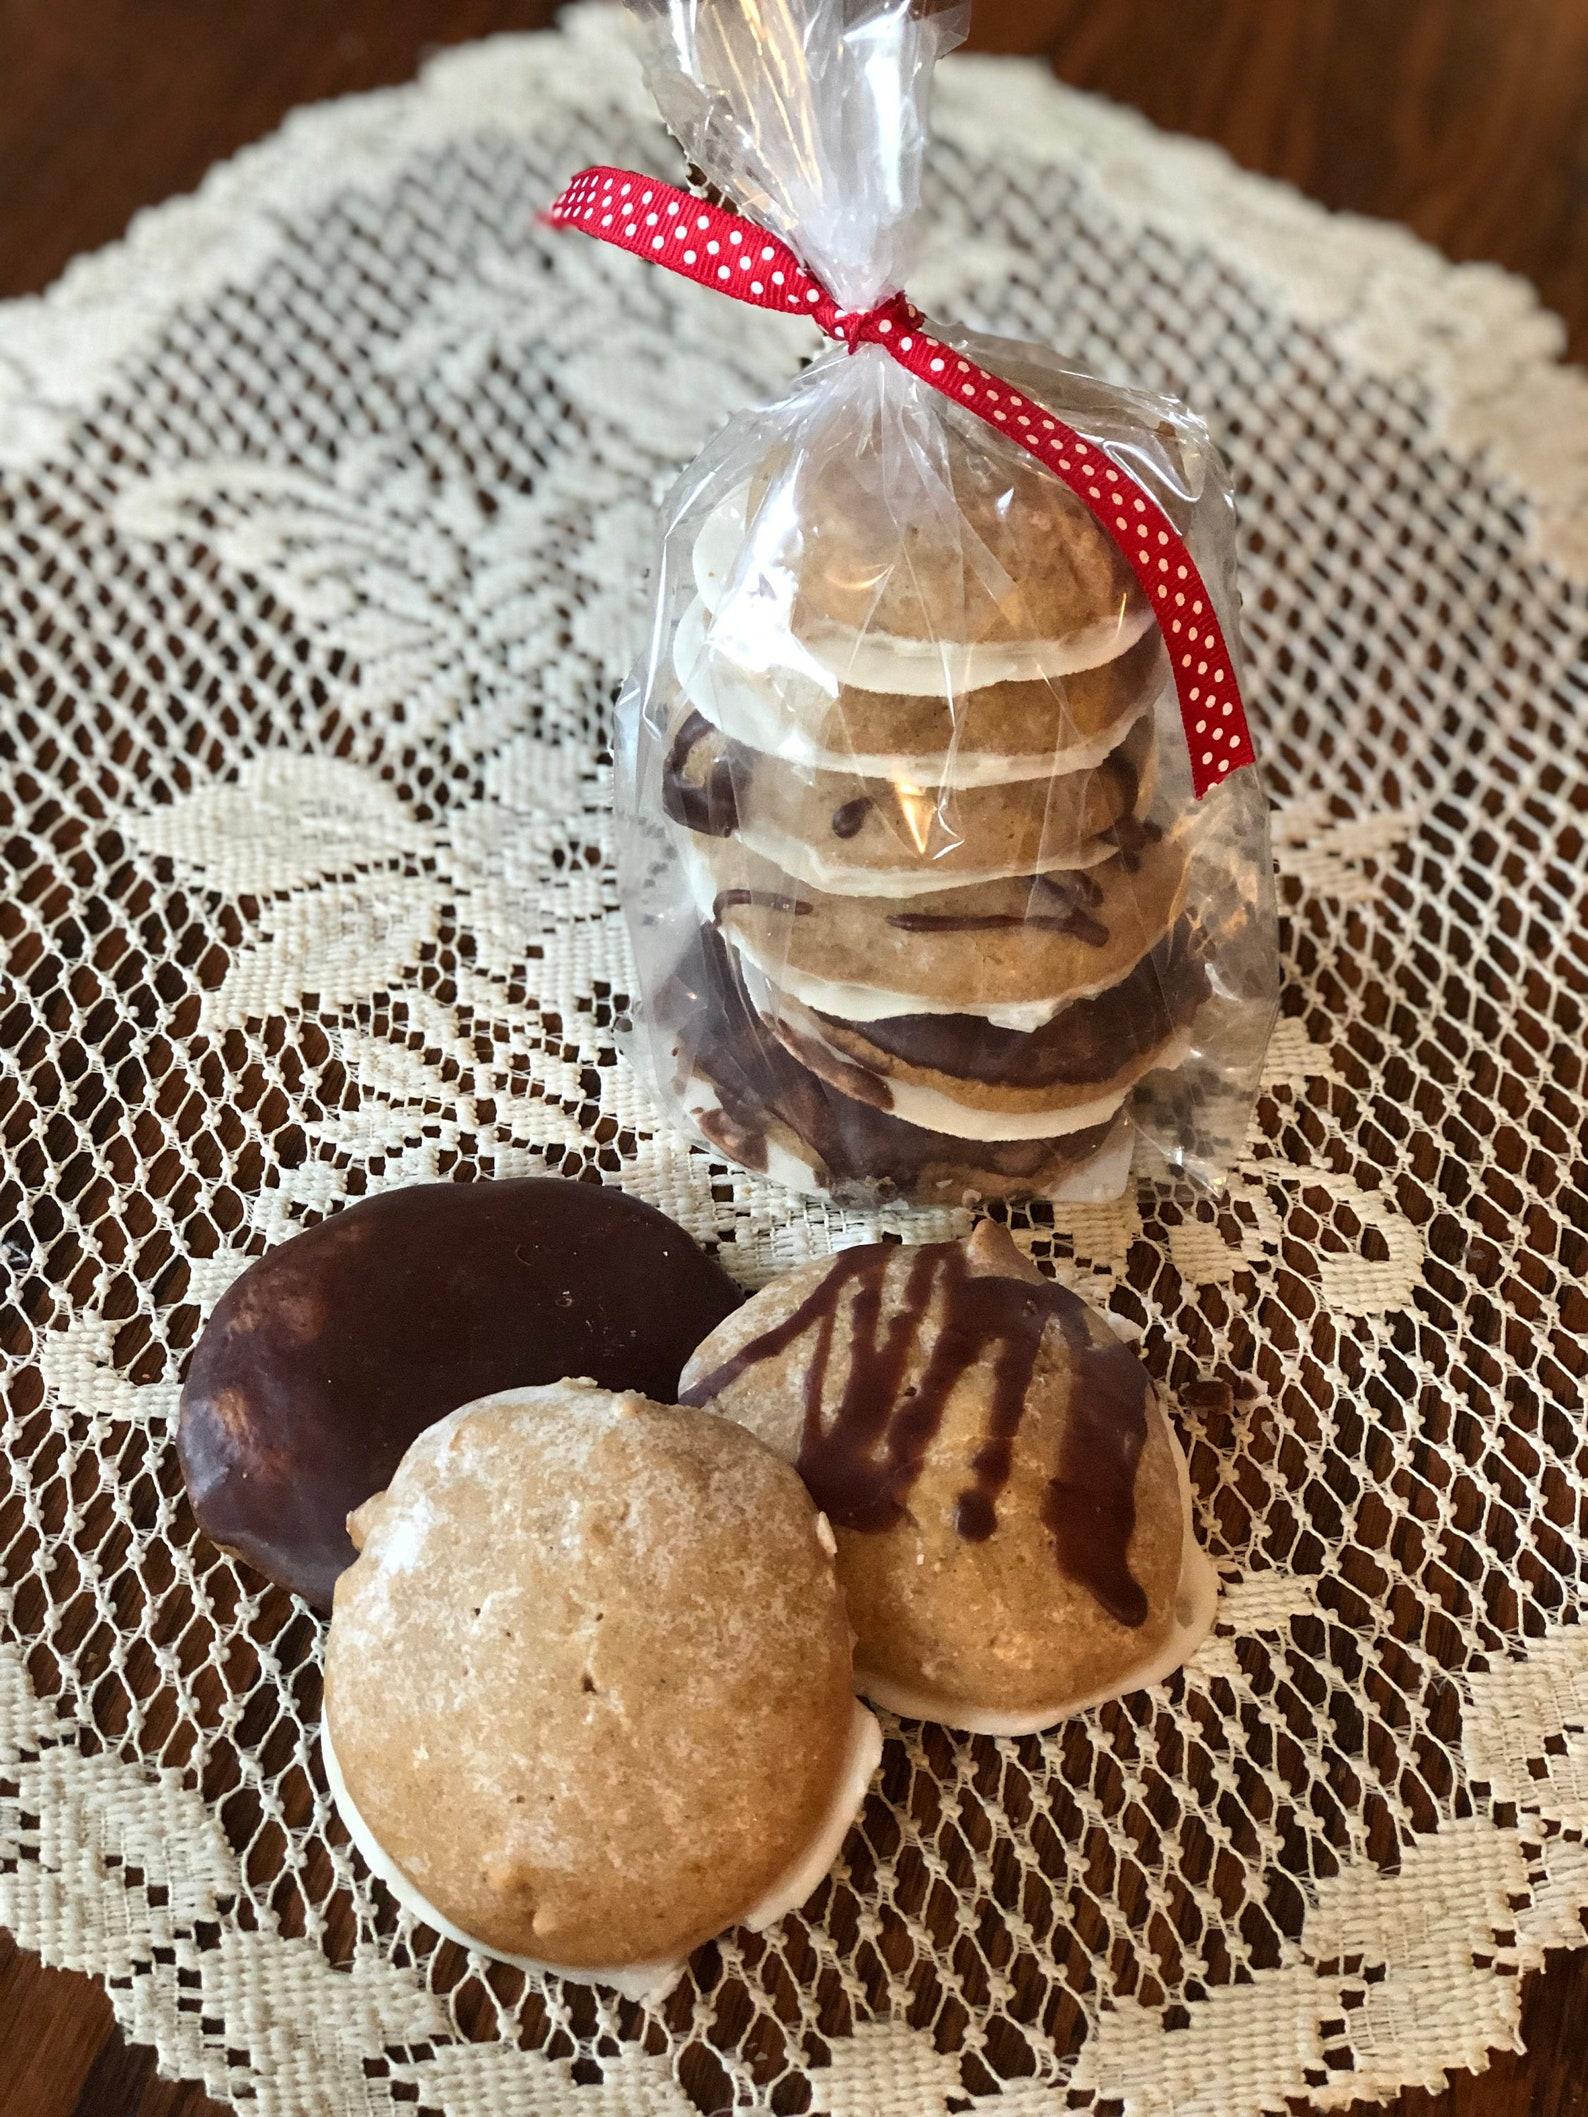 Lebkuchen- German Soft Gingerbread Cookie (6 Per Order)